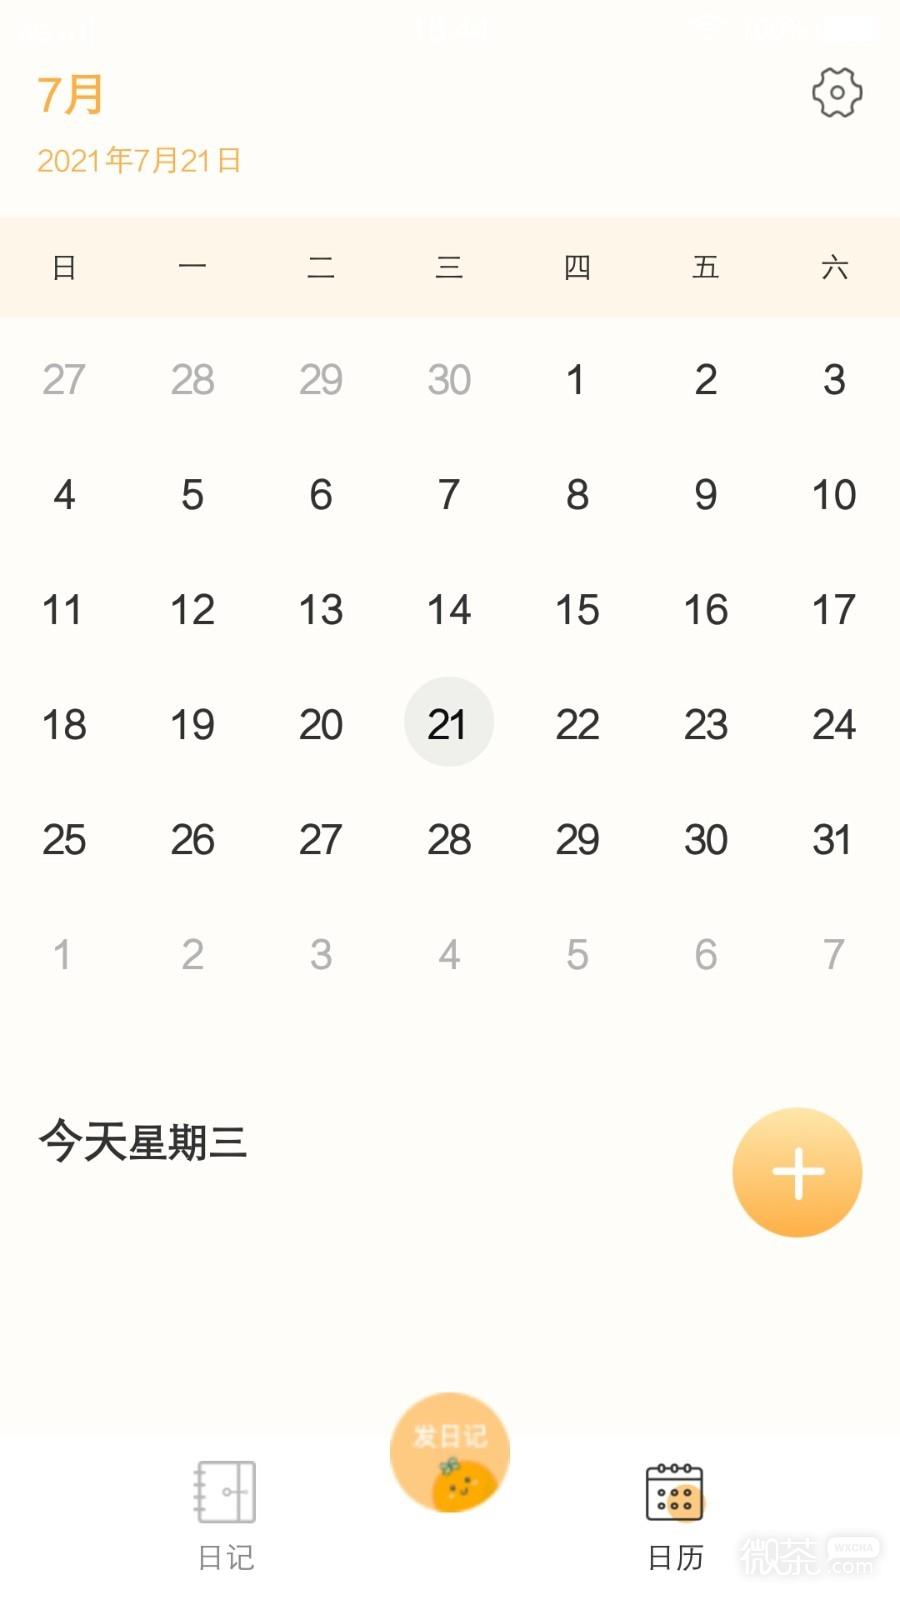 http://img.wxcha.com/小黄书